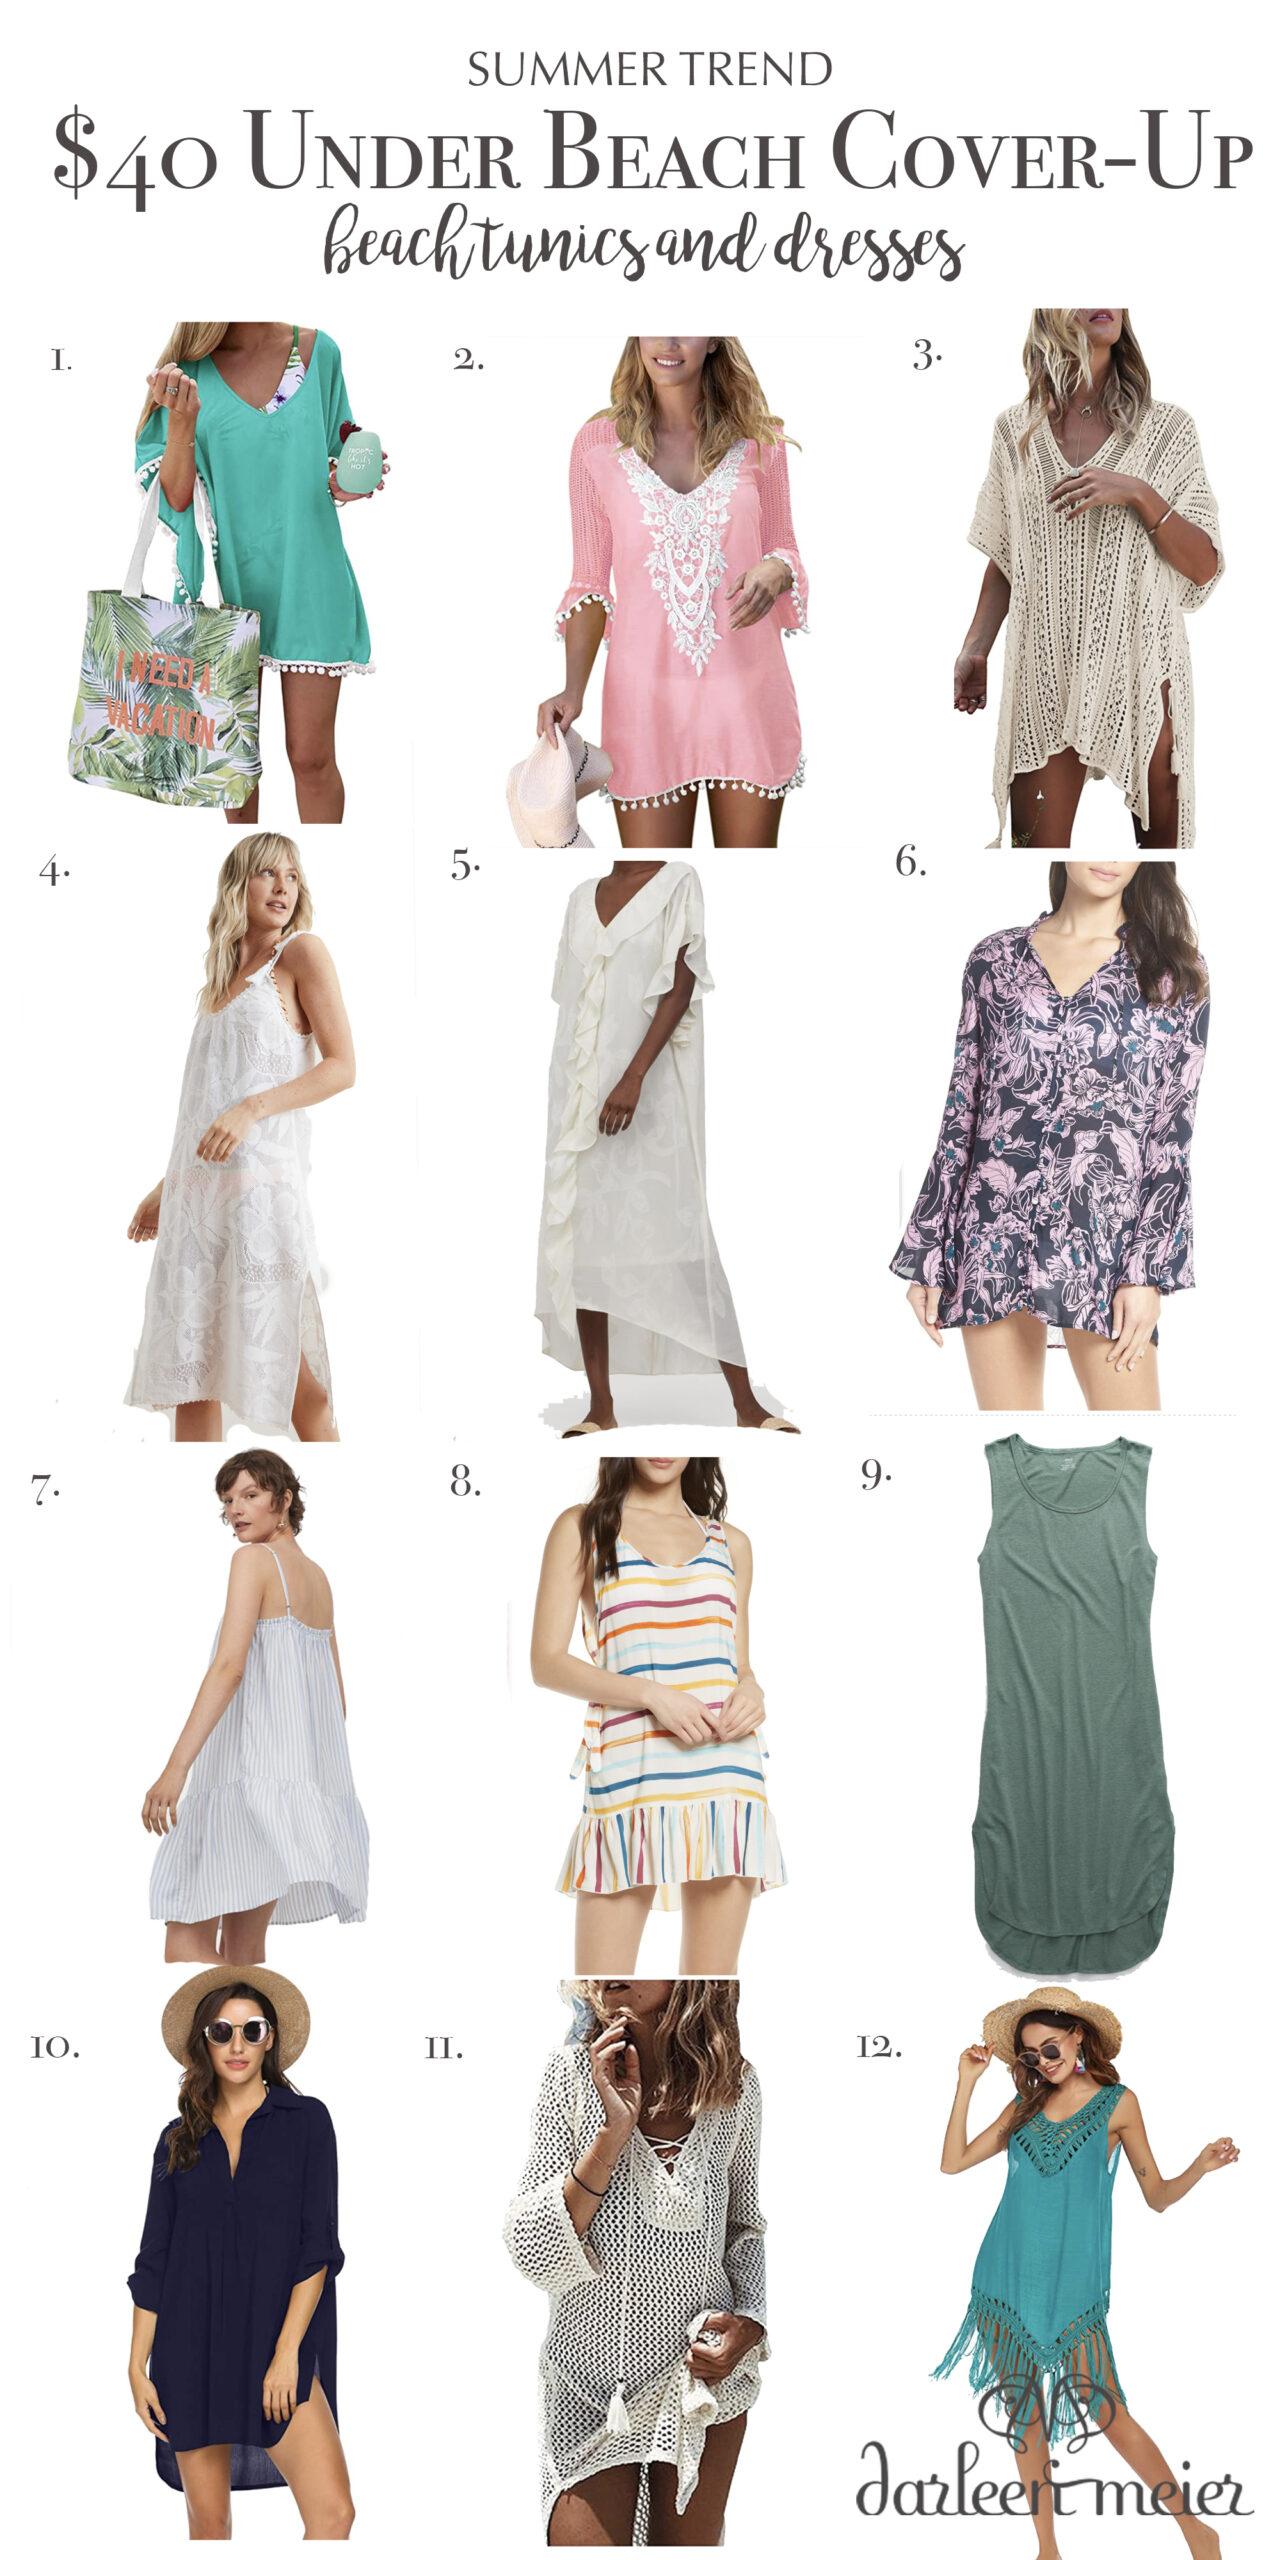 The best beach cover-ups under $40, beach tunics and dresses, summer trend, summer essential || Darling Darleen Top Lifestyle CT Blogger #beachcoverups #darlingdarleen #darleenmeier